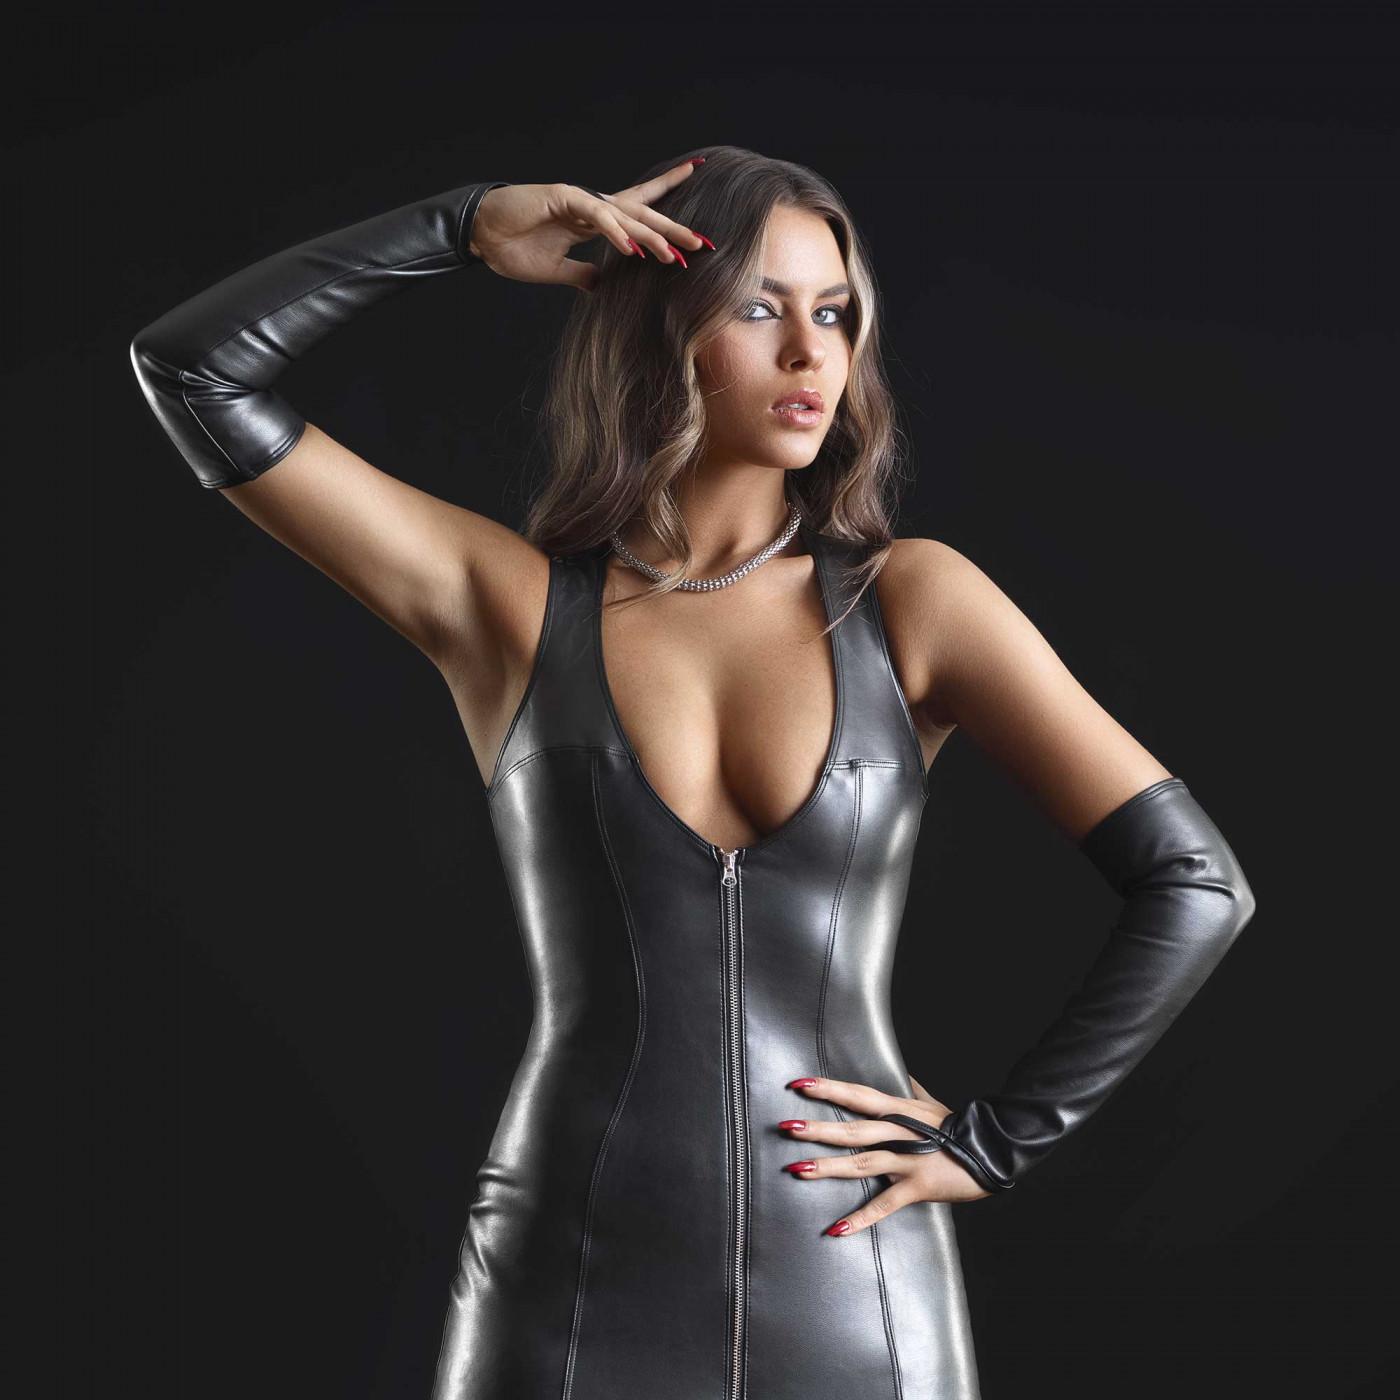 Mitaines fétiches en faux cuir noir - Patrice Catanzaro